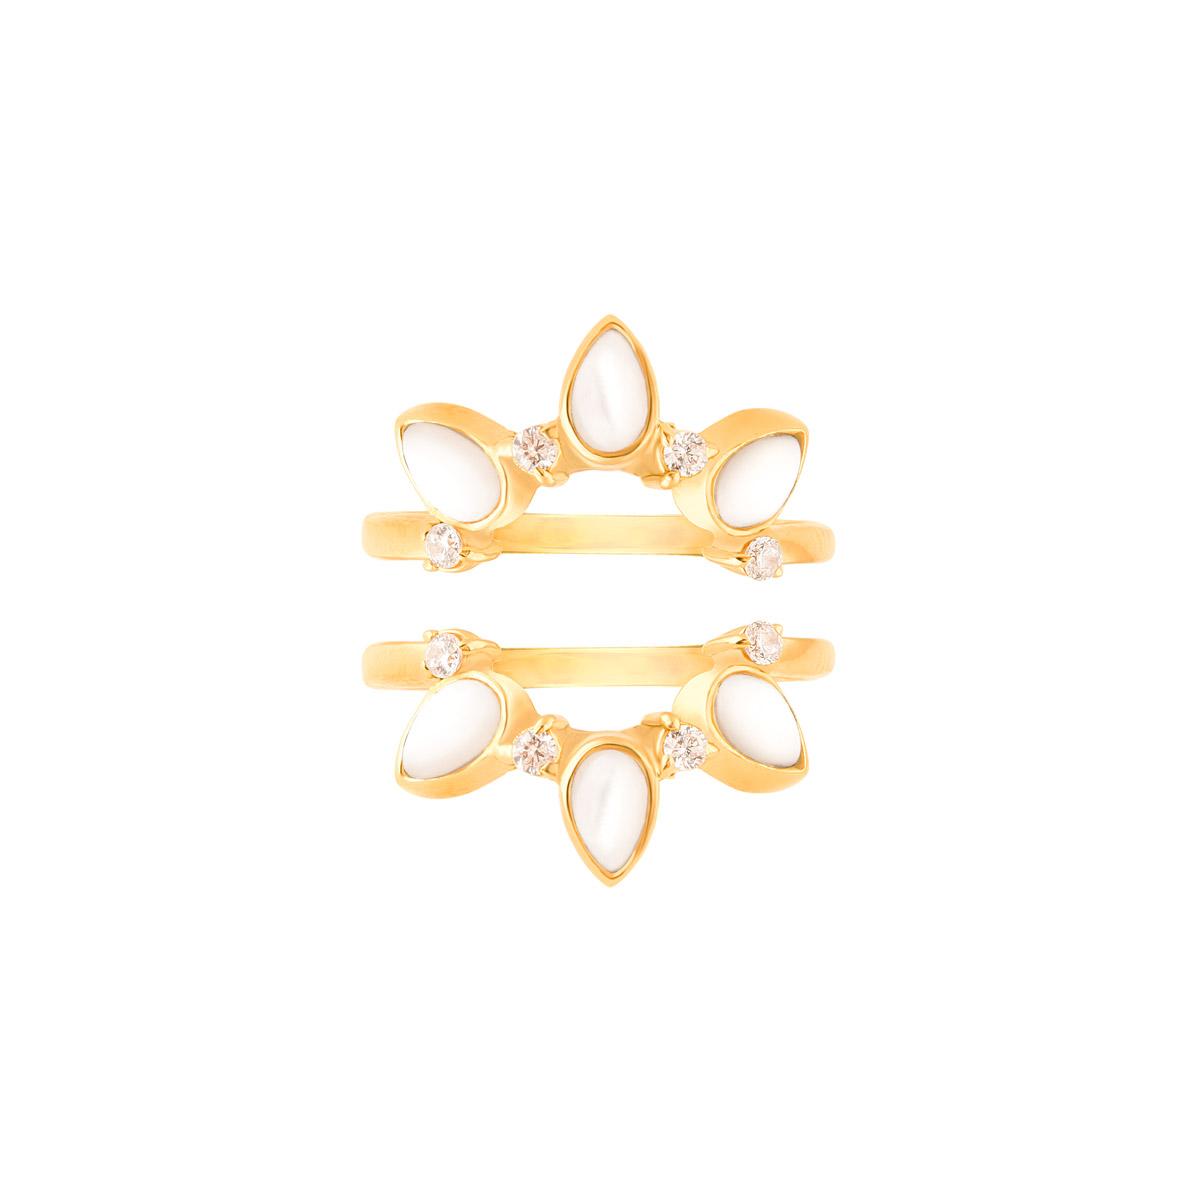 انگشتر طلا مینِلاوا و صدف پرسته